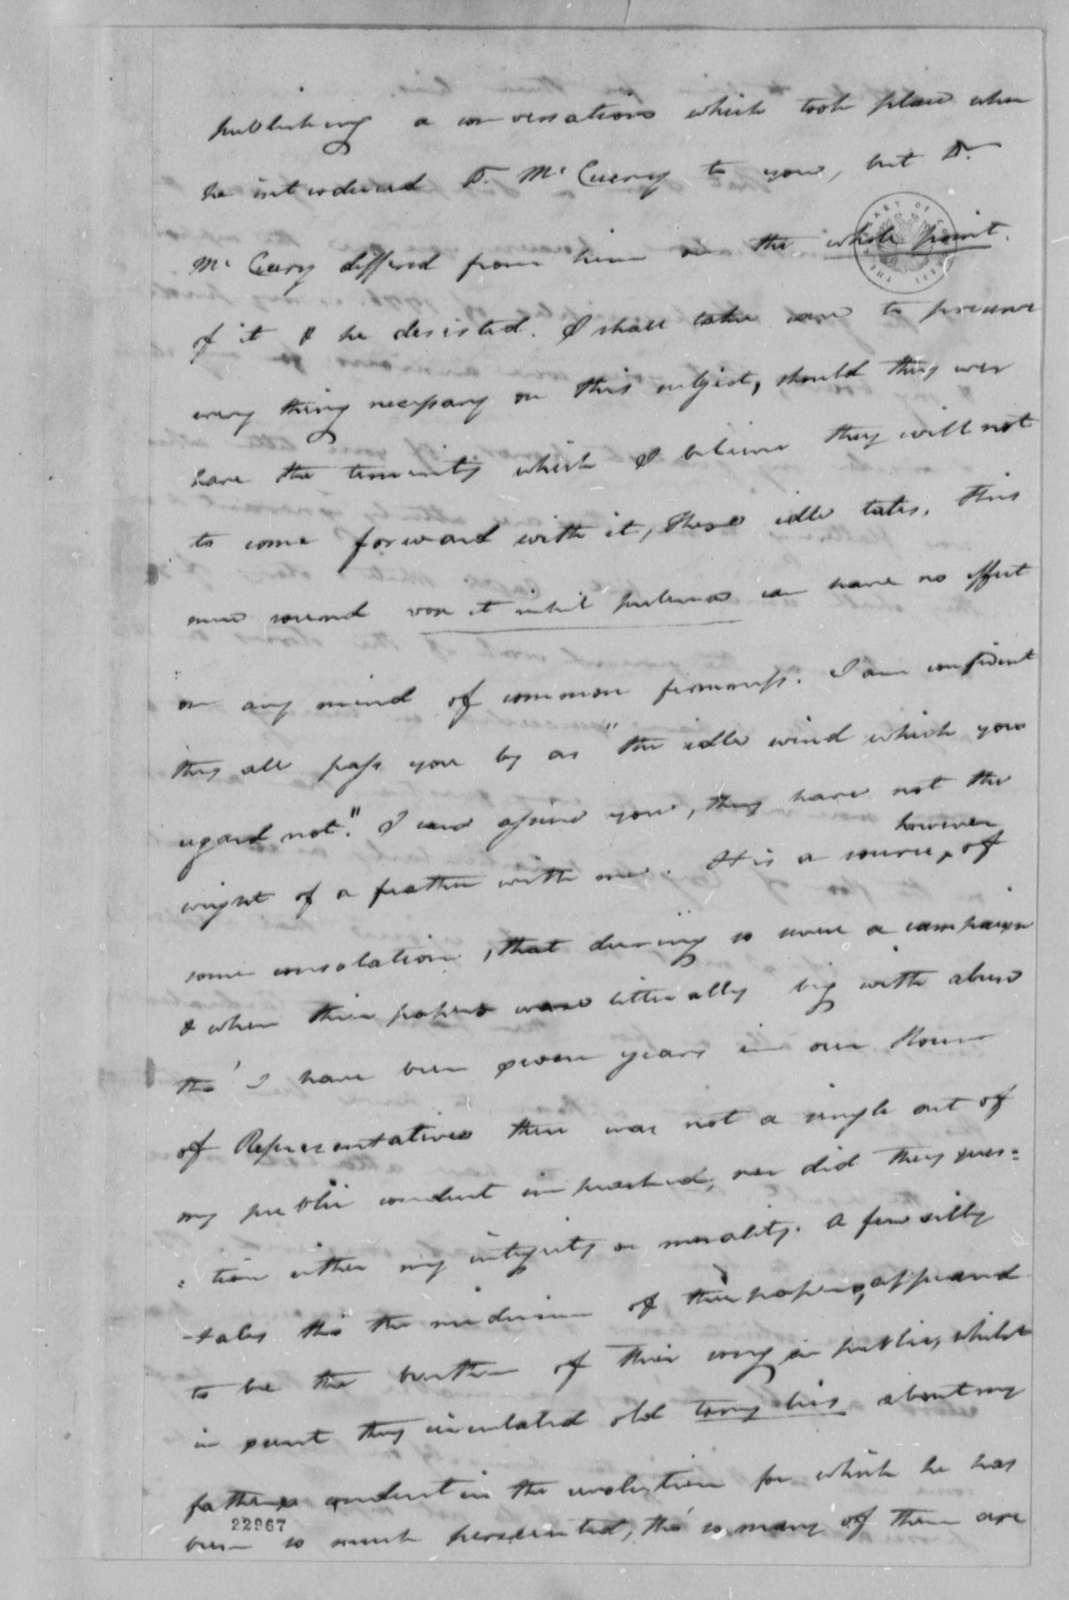 Caesar A. Rodney to Thomas Jefferson, 1802, Received November 4, 1802